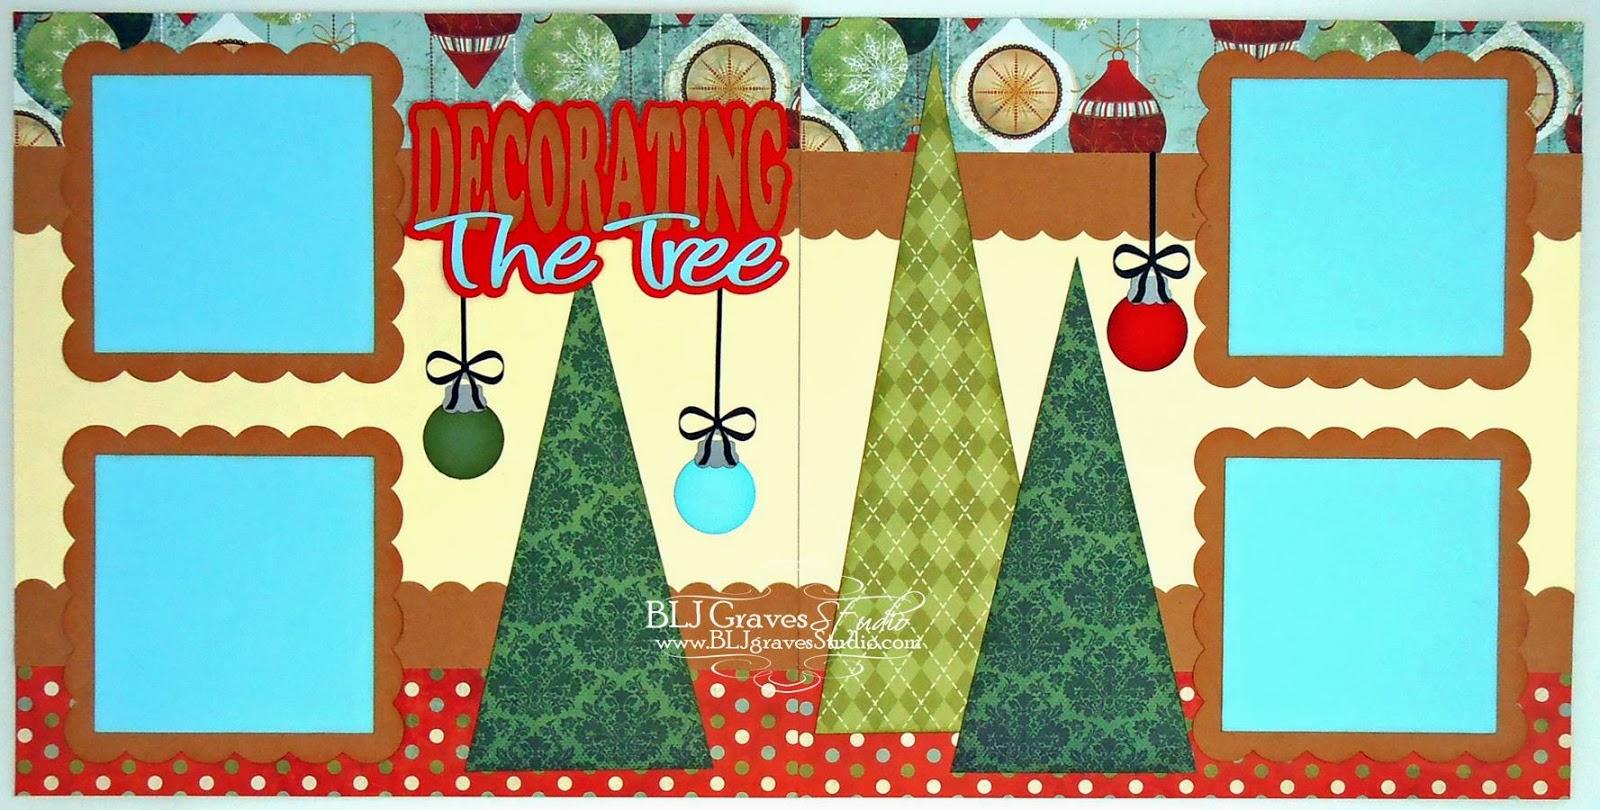 BLJ Graves Studio: Christmas Decorating The Tree Scrapbook